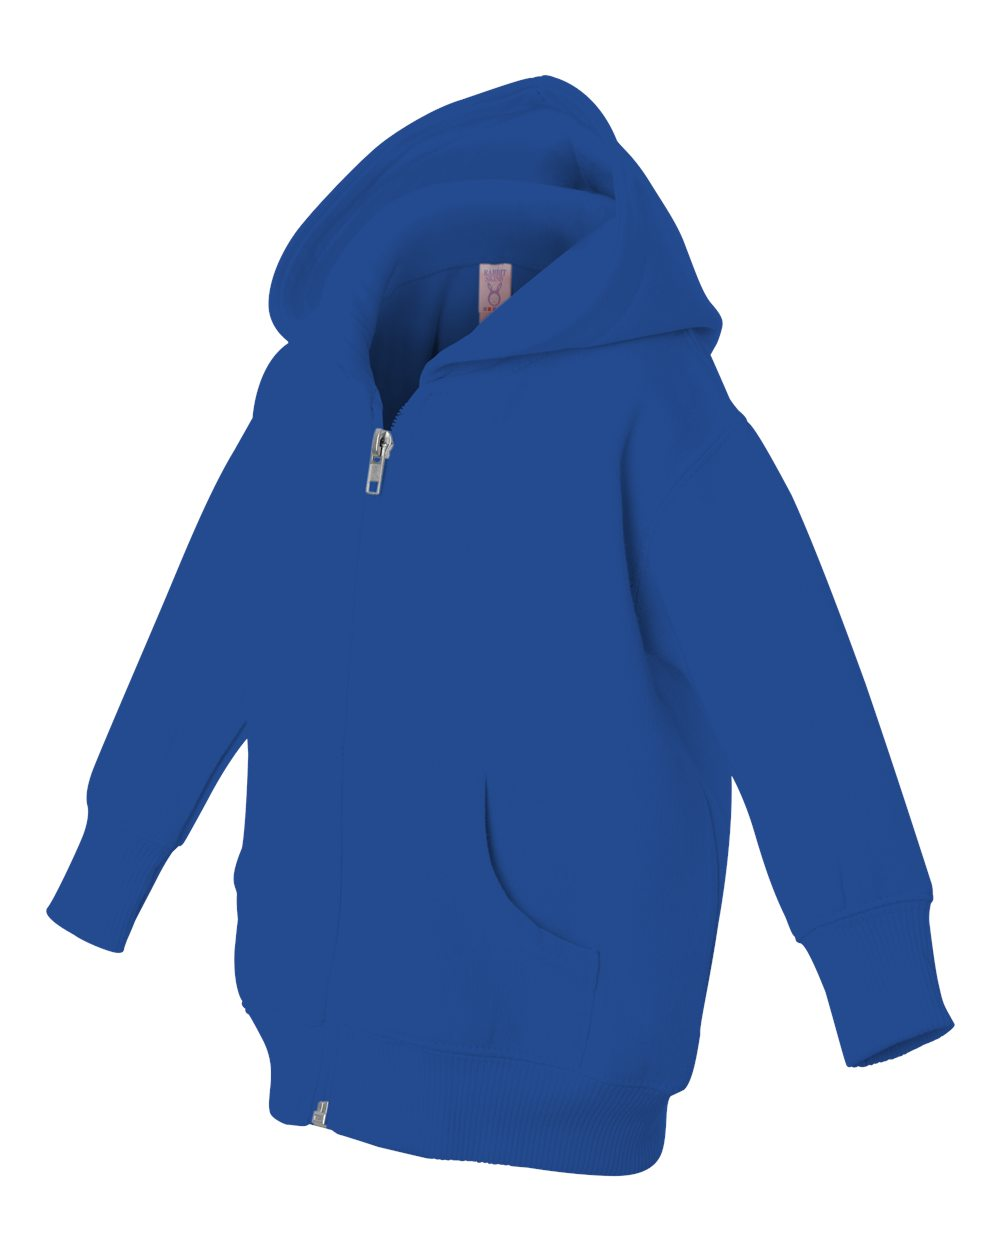 Rabbit Skins 3446 - Infant Hooded Full-Zip Sweatshirt